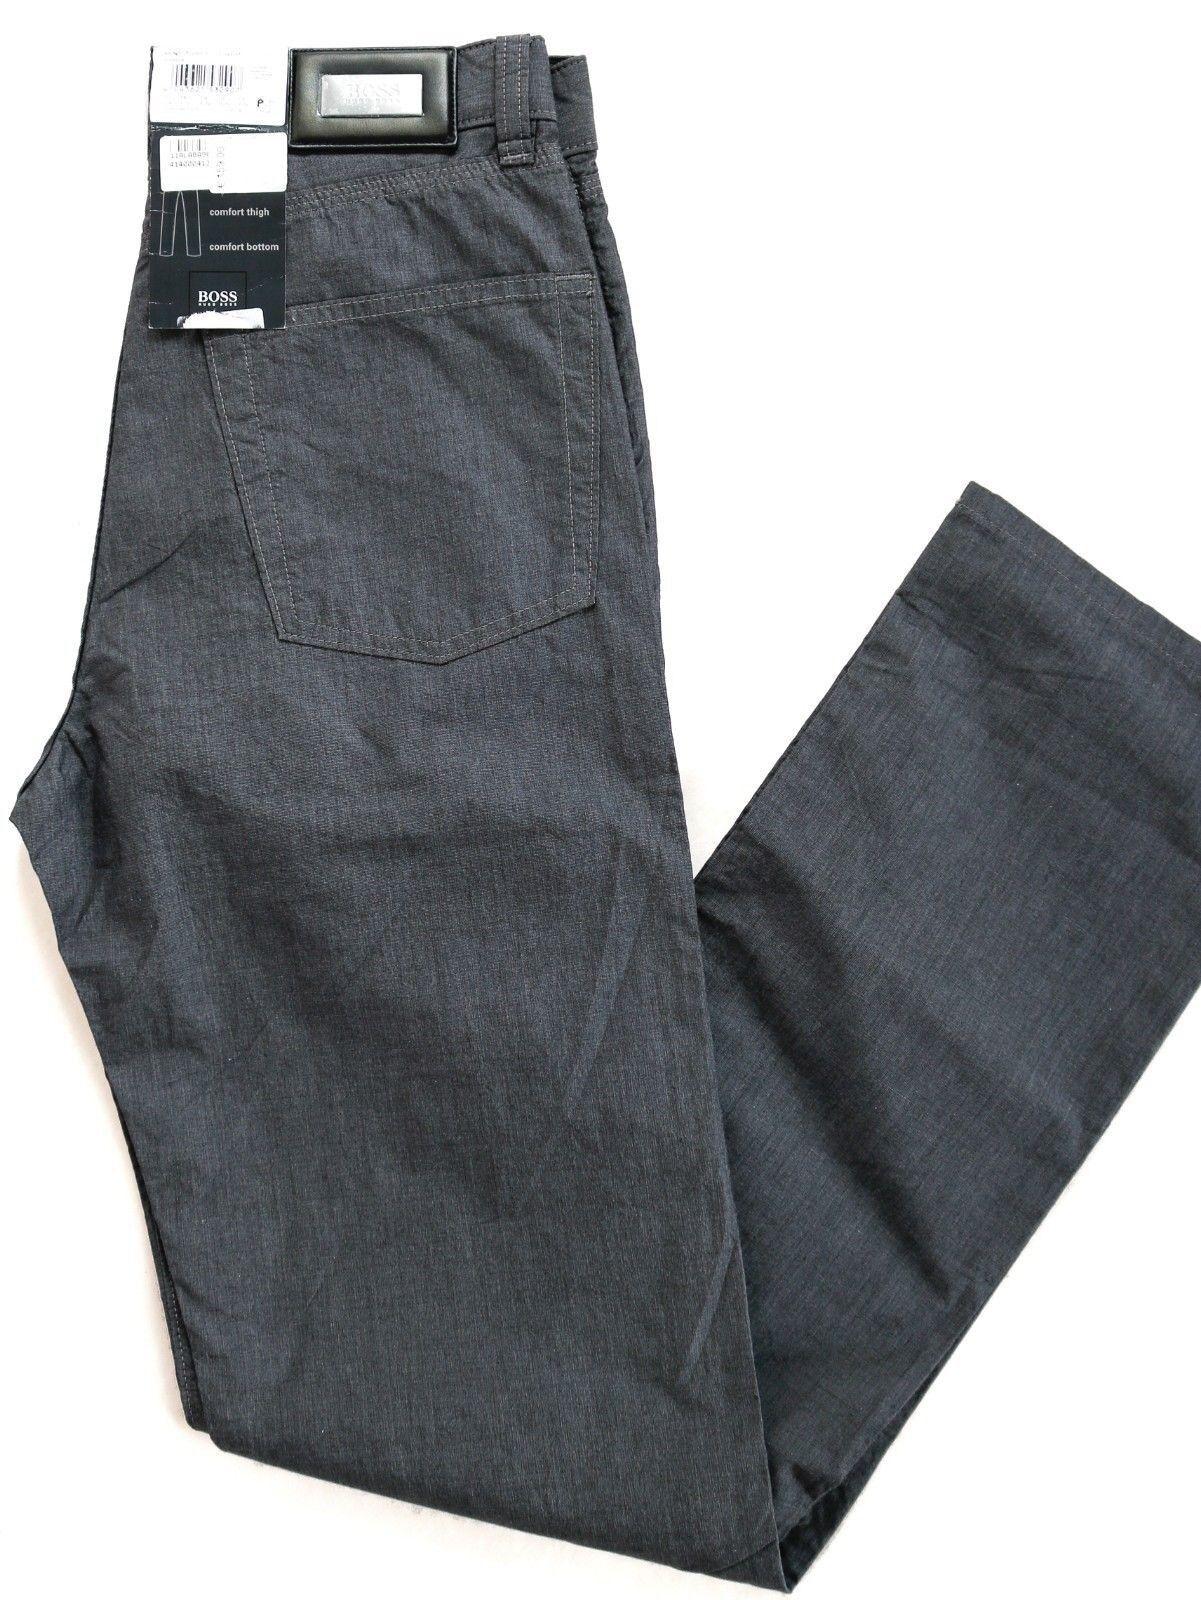 Hugo Boss - Men's Cloth Trousers - Comfort Fit - High Waist - W28 W29 - Grey